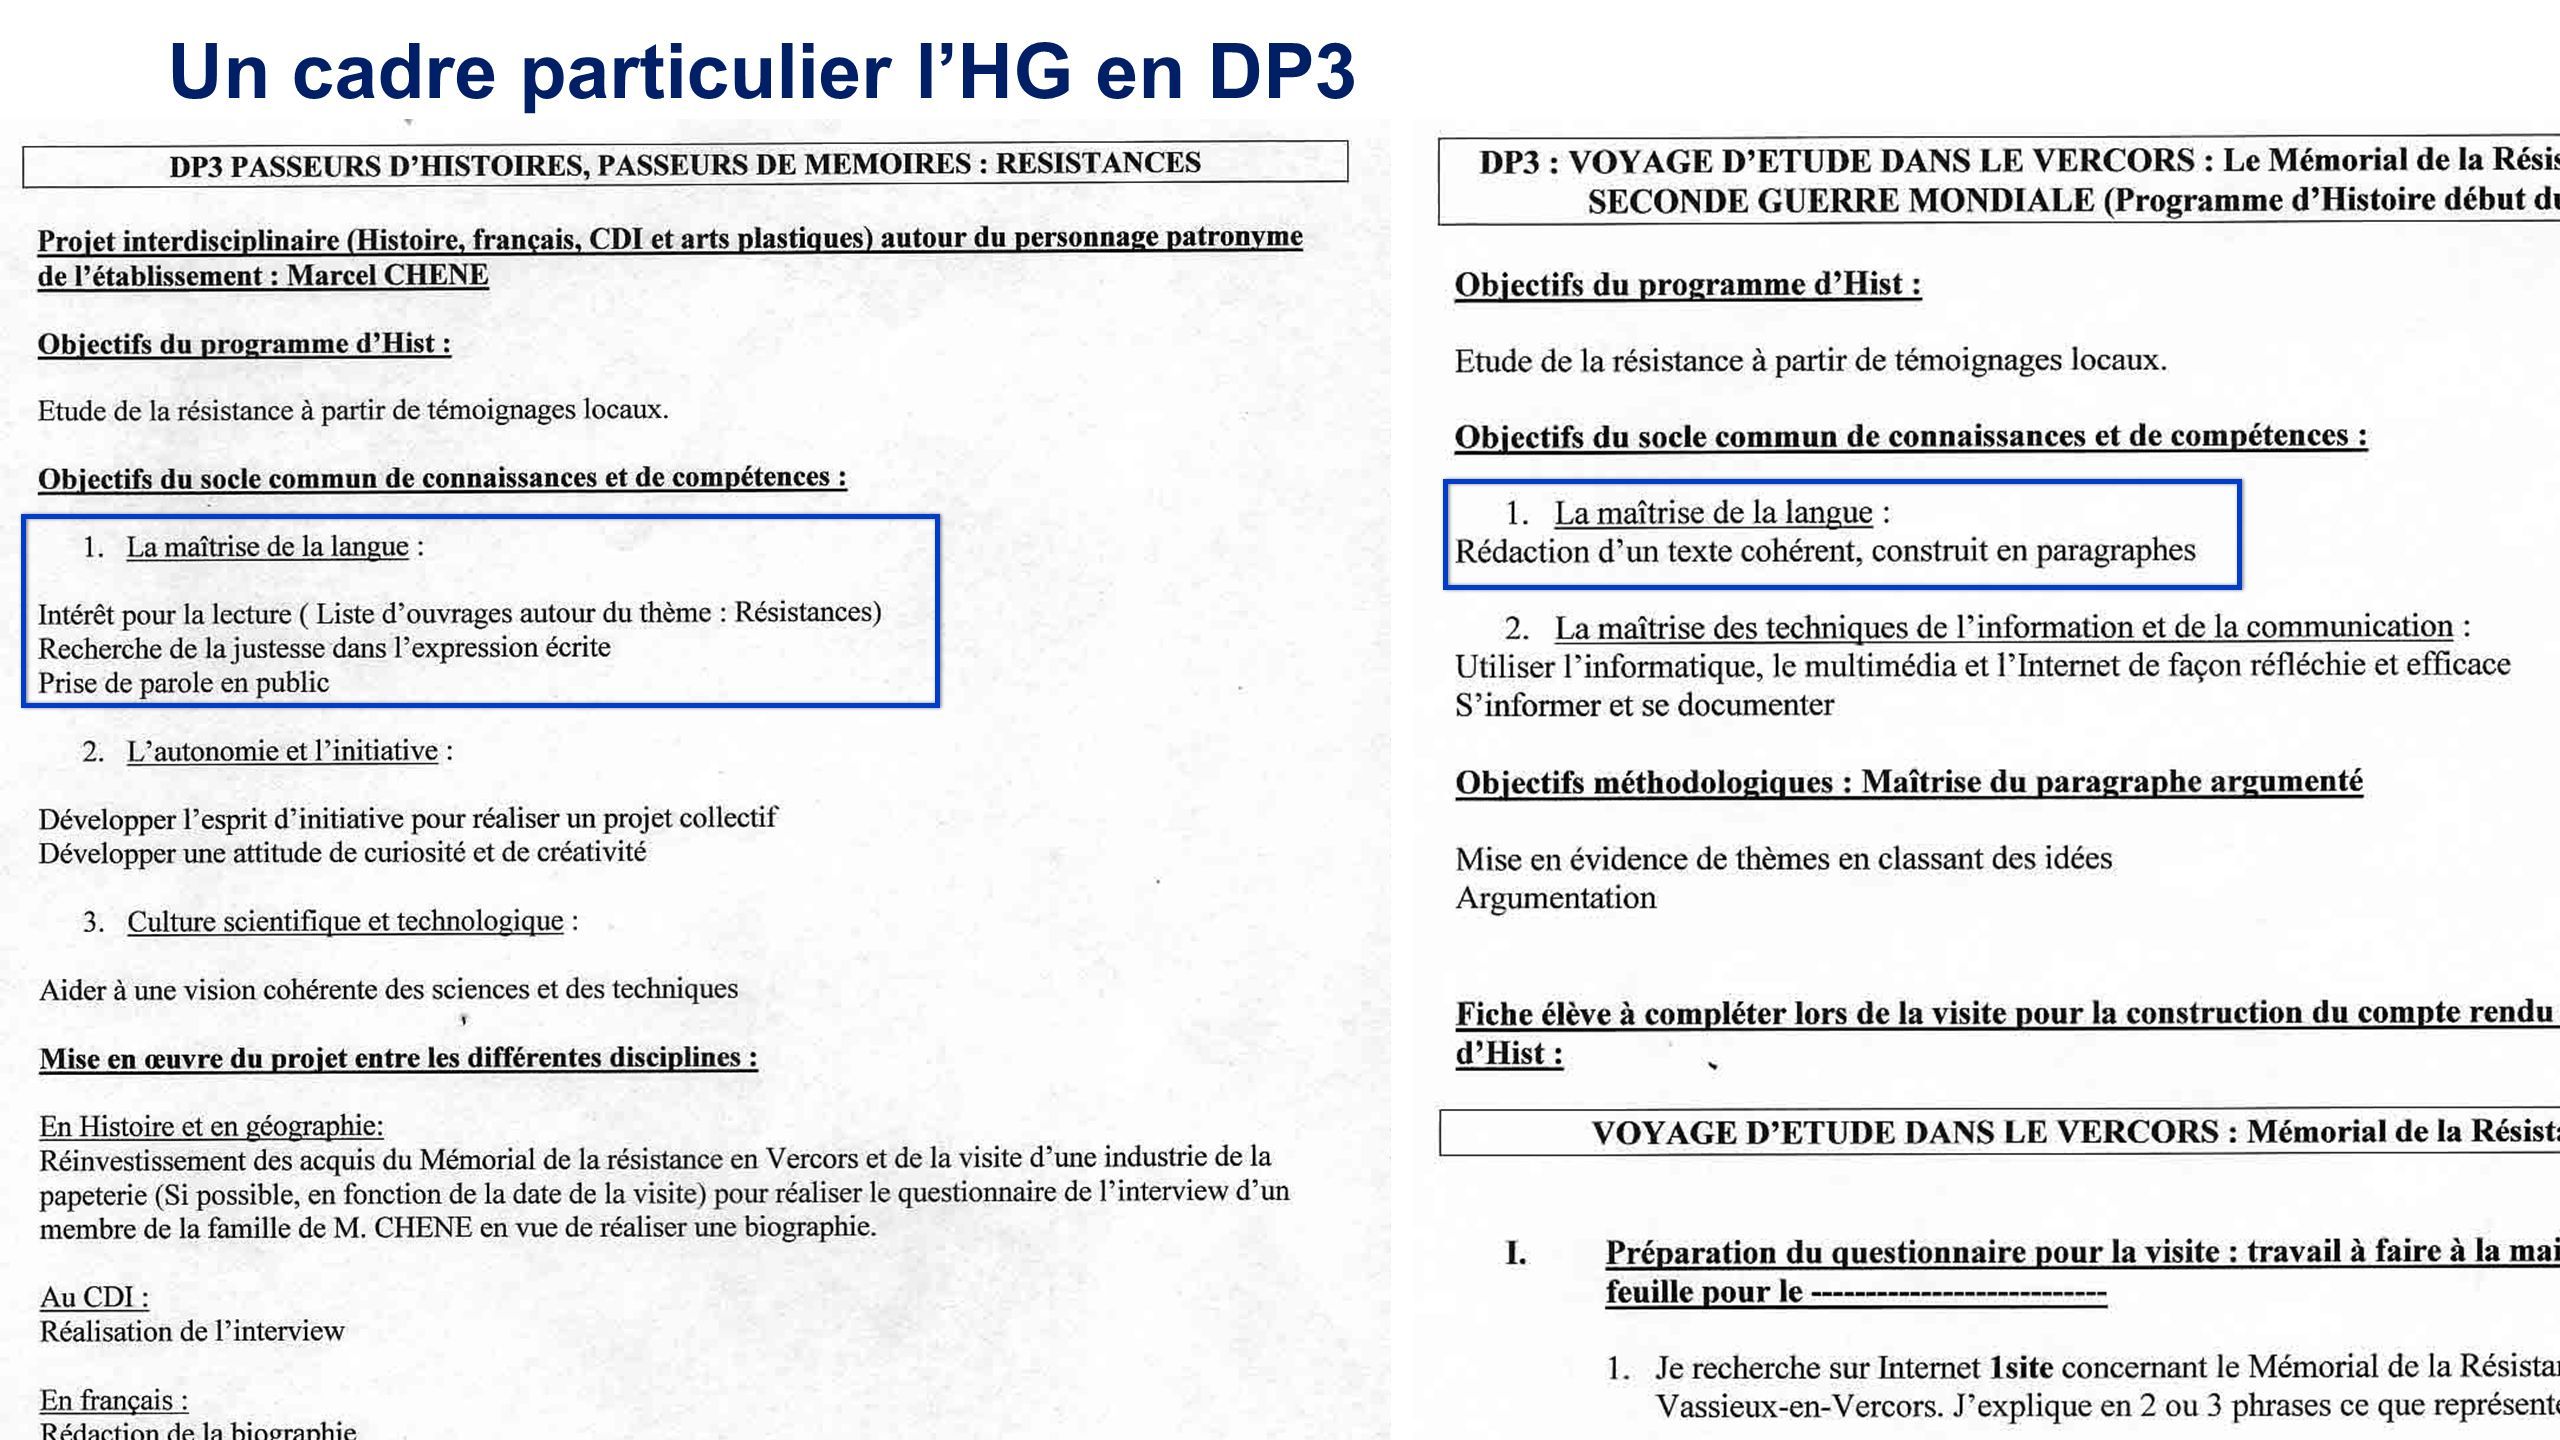 Un cadre particulier l'HG en DP3